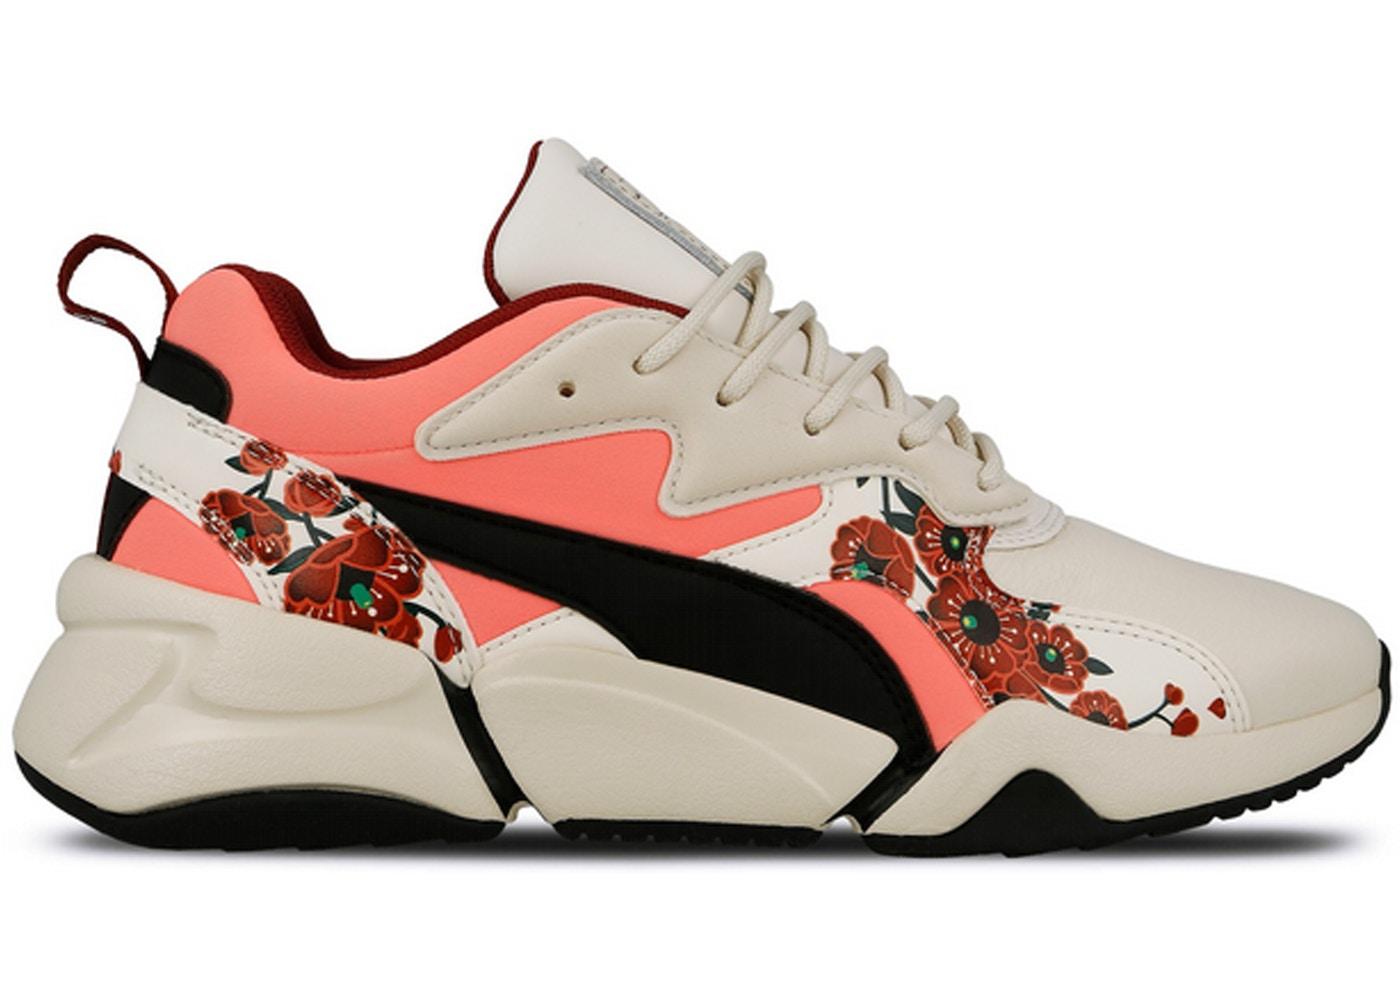 1ff904607c49 Puma Nova Sue Tsai Cherry Bombs (W) - 369560-01